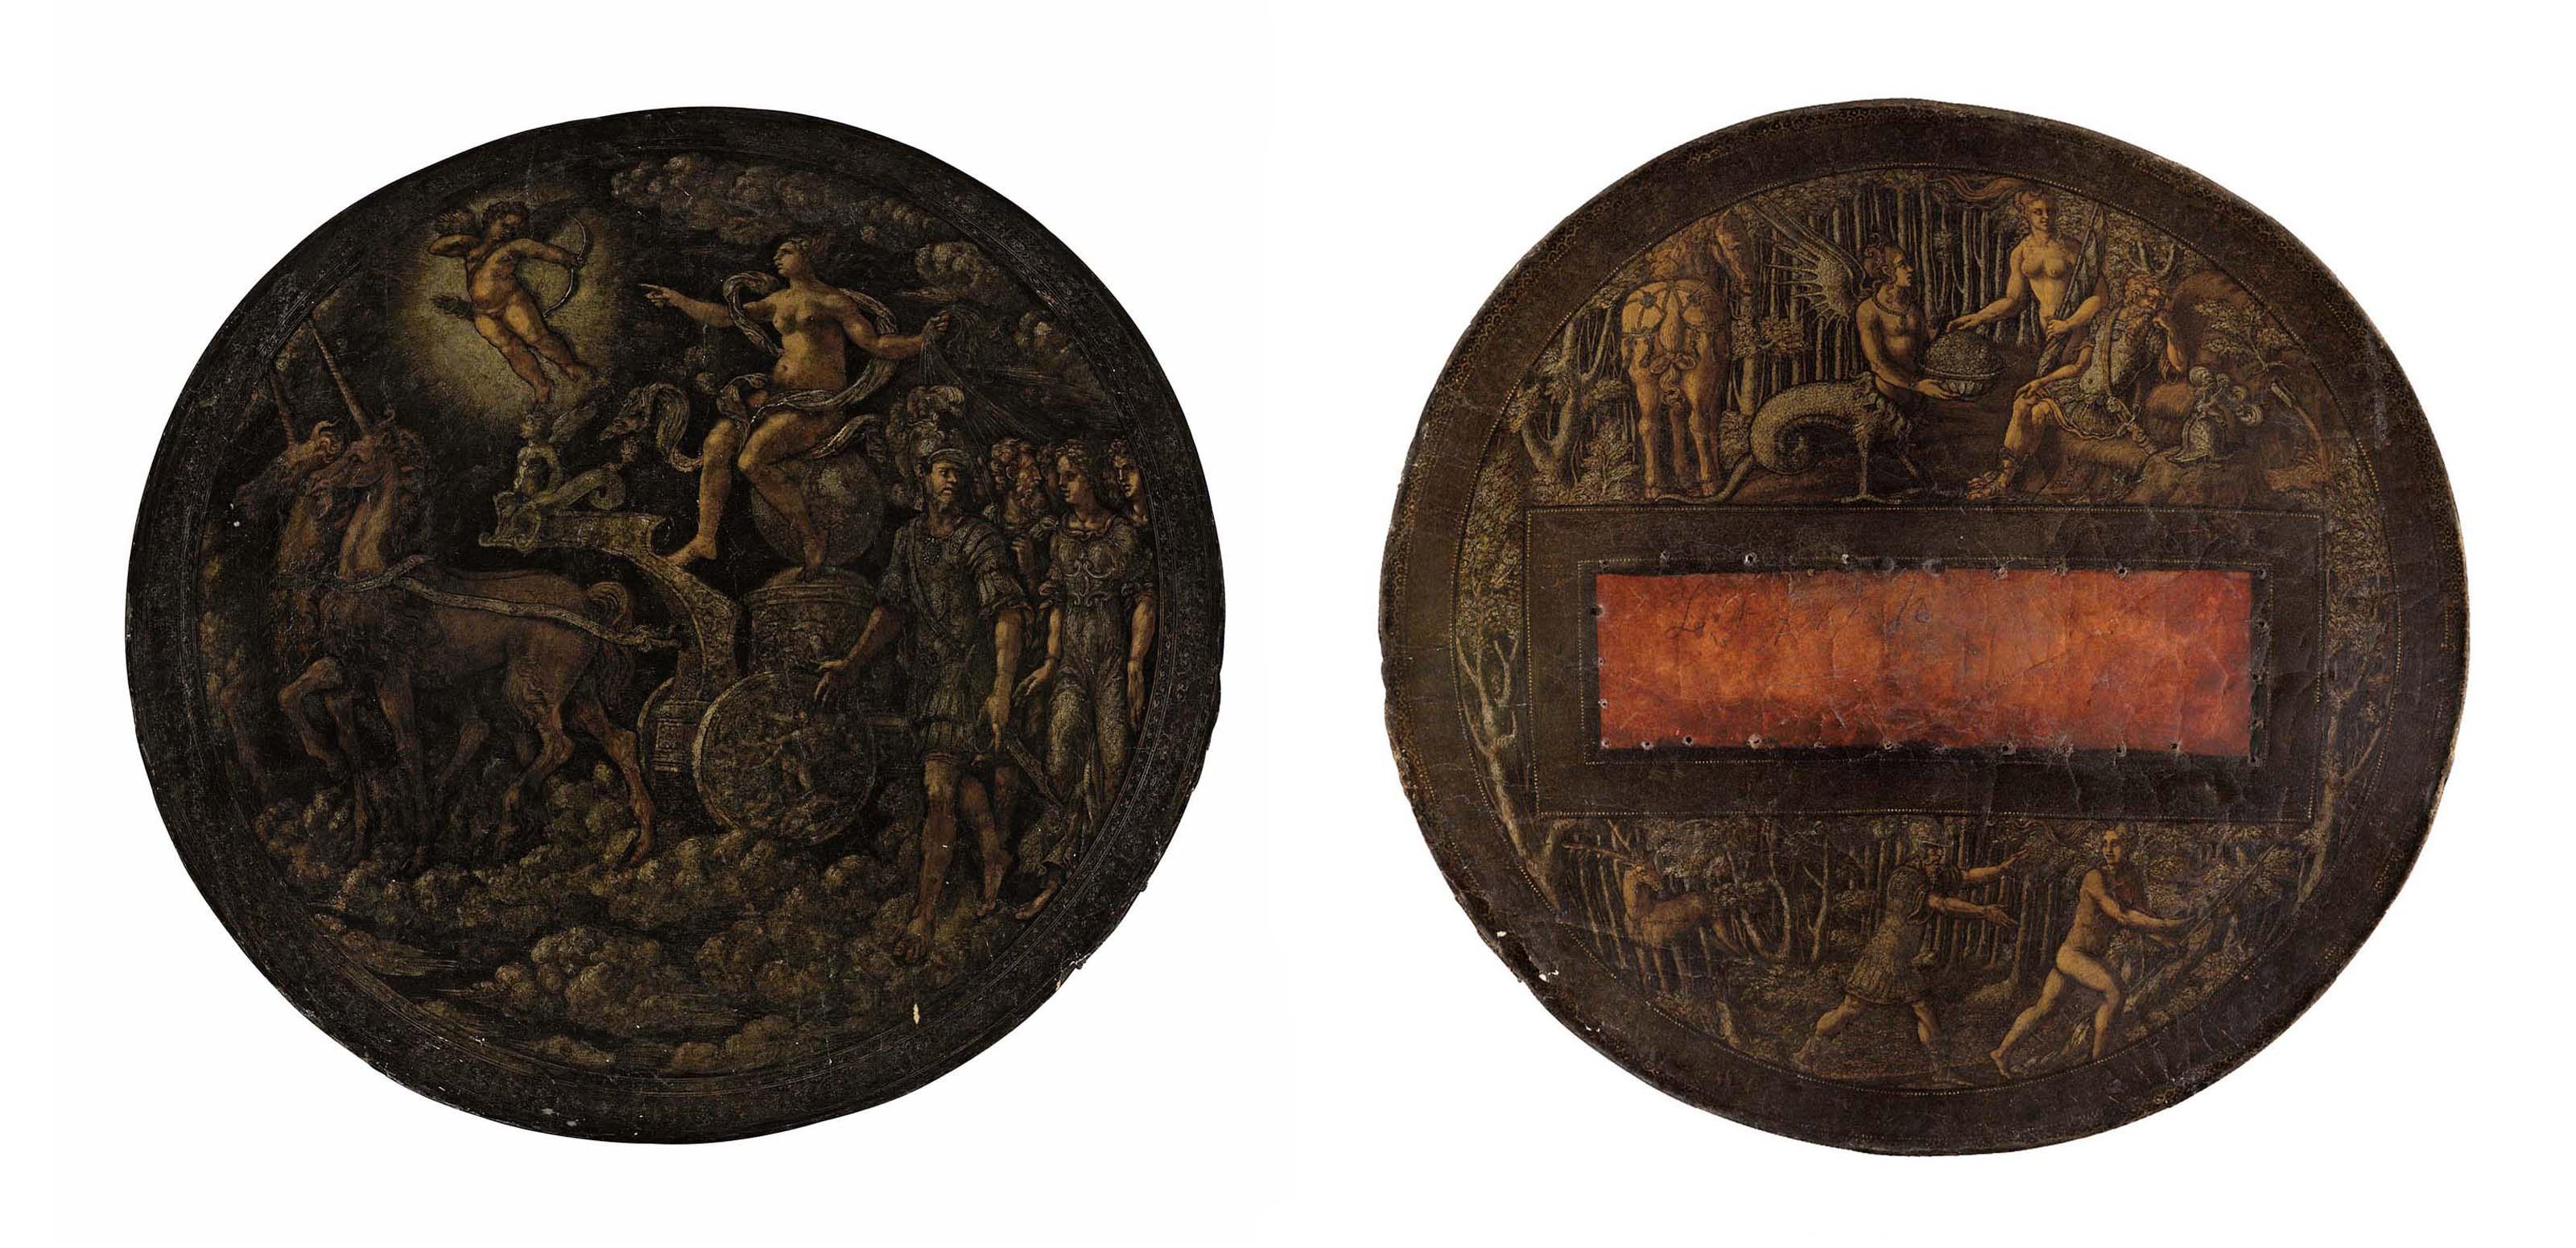 Attributed to Girolamo da Trev